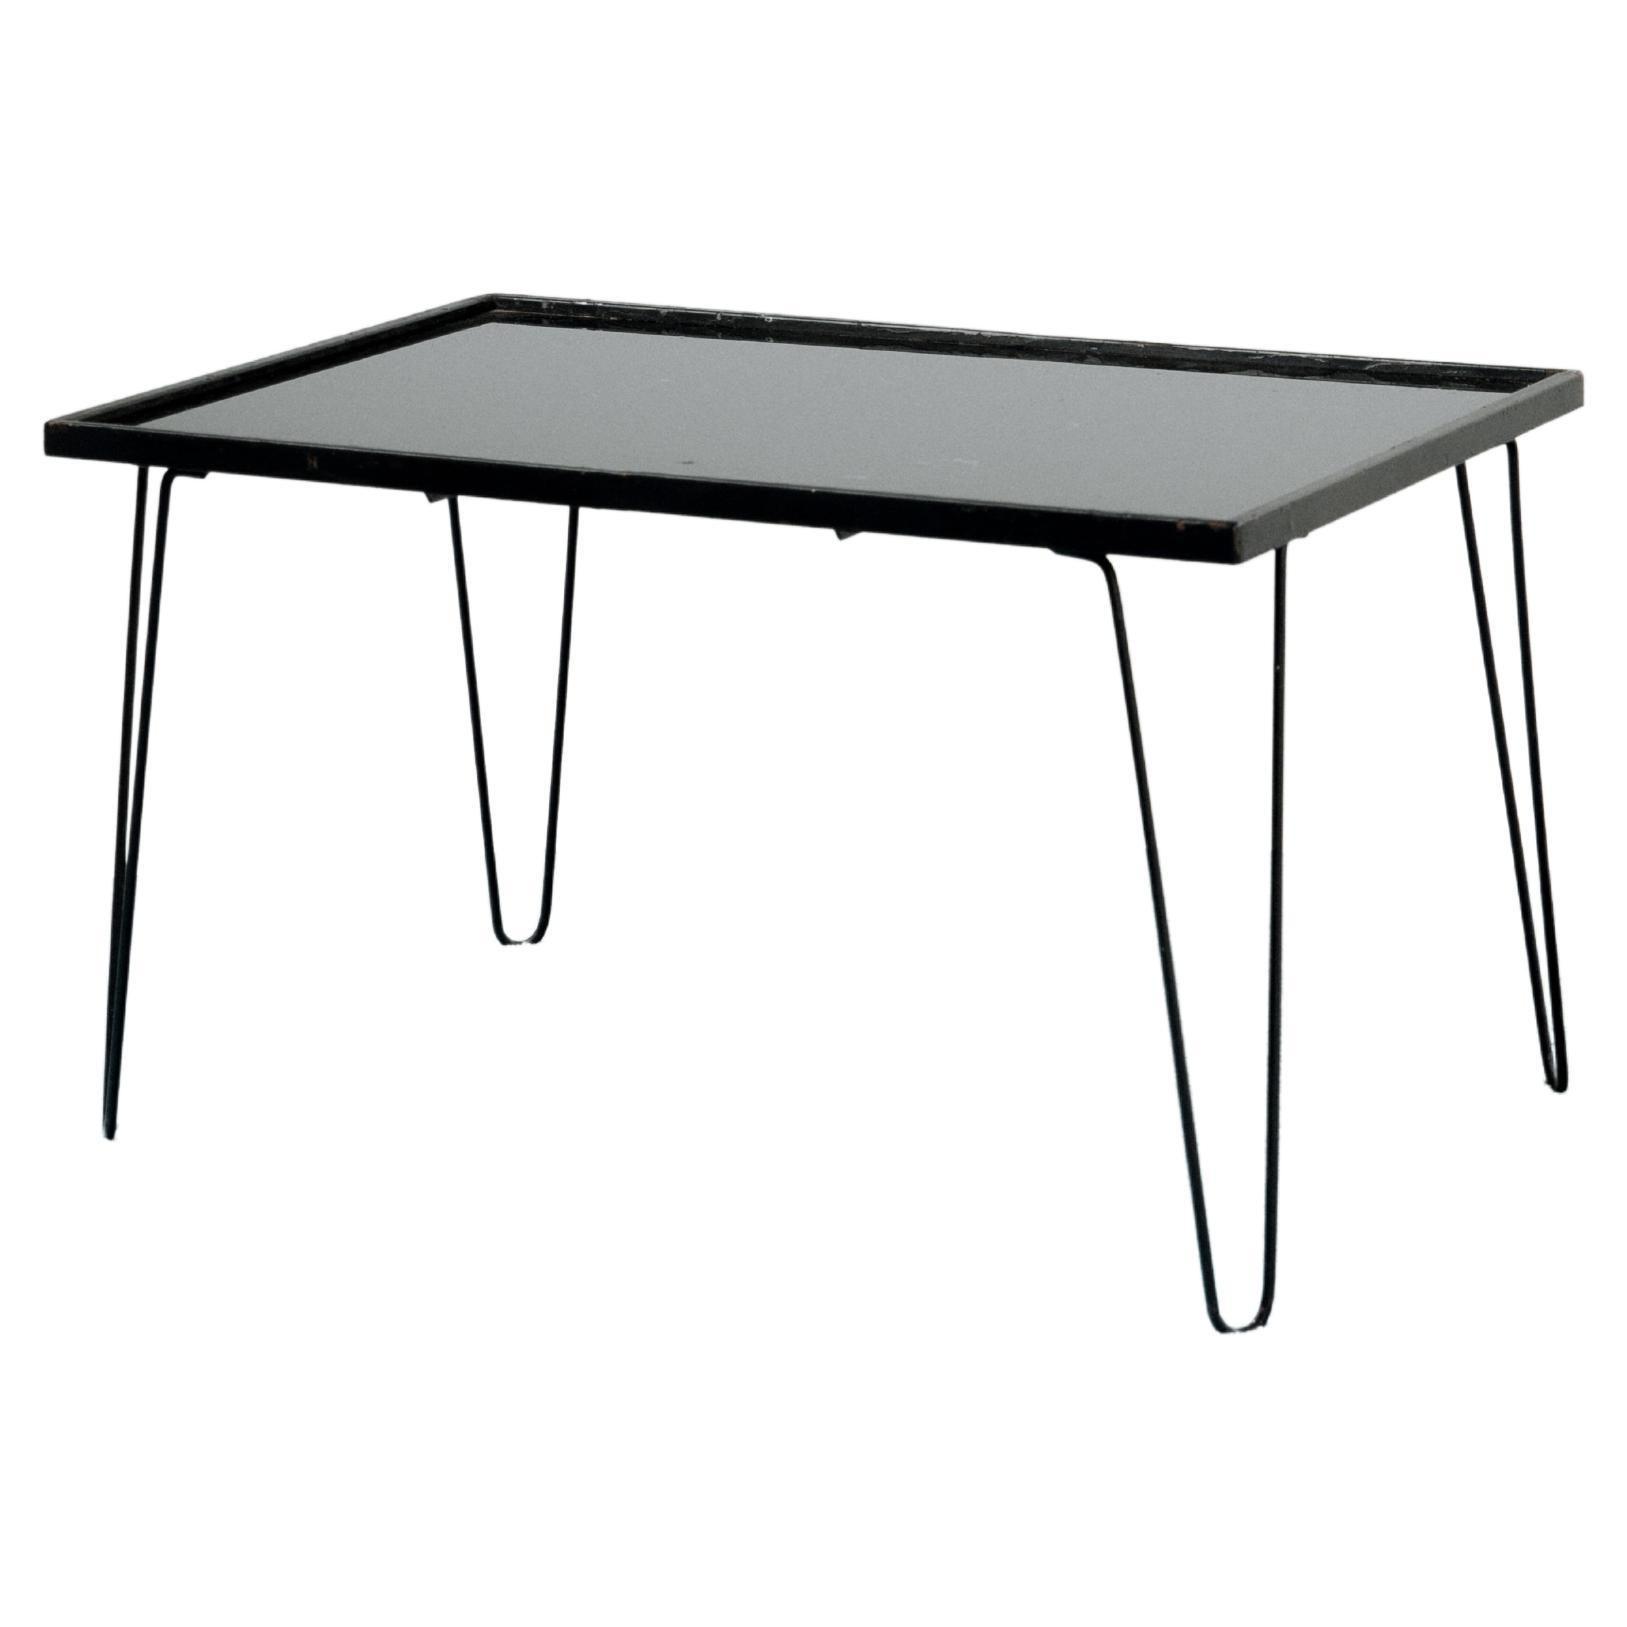 Mid-Century Modern Iron Coffee Table